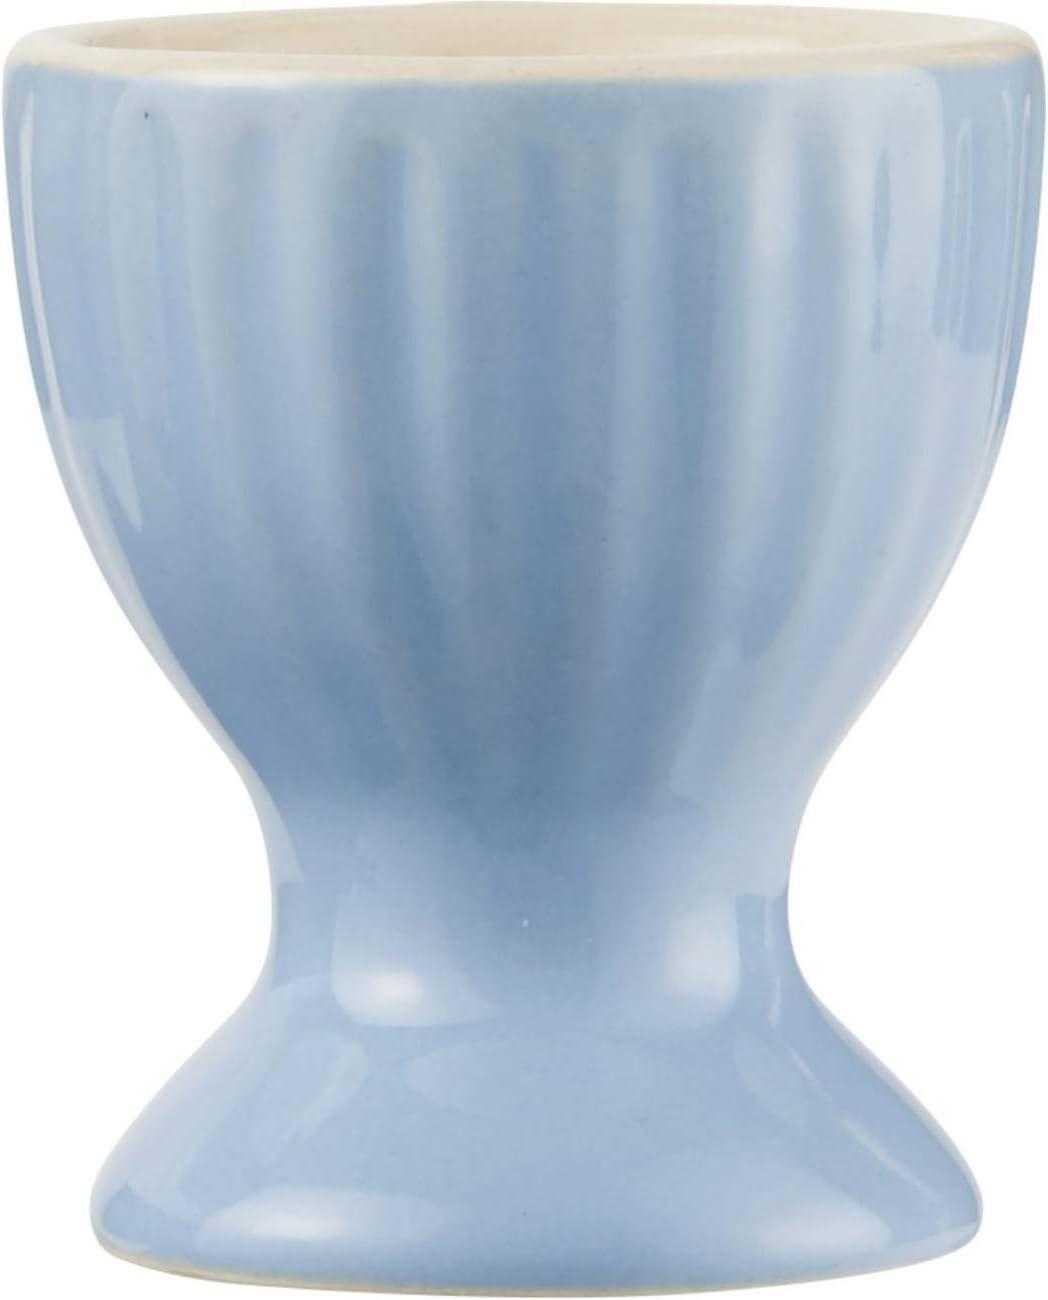 CREAFLOR HOME 6er Set Eierbecher MYNTE Nordic Sky hellblau H 6cm D 5cm Steingut Ib Laursen